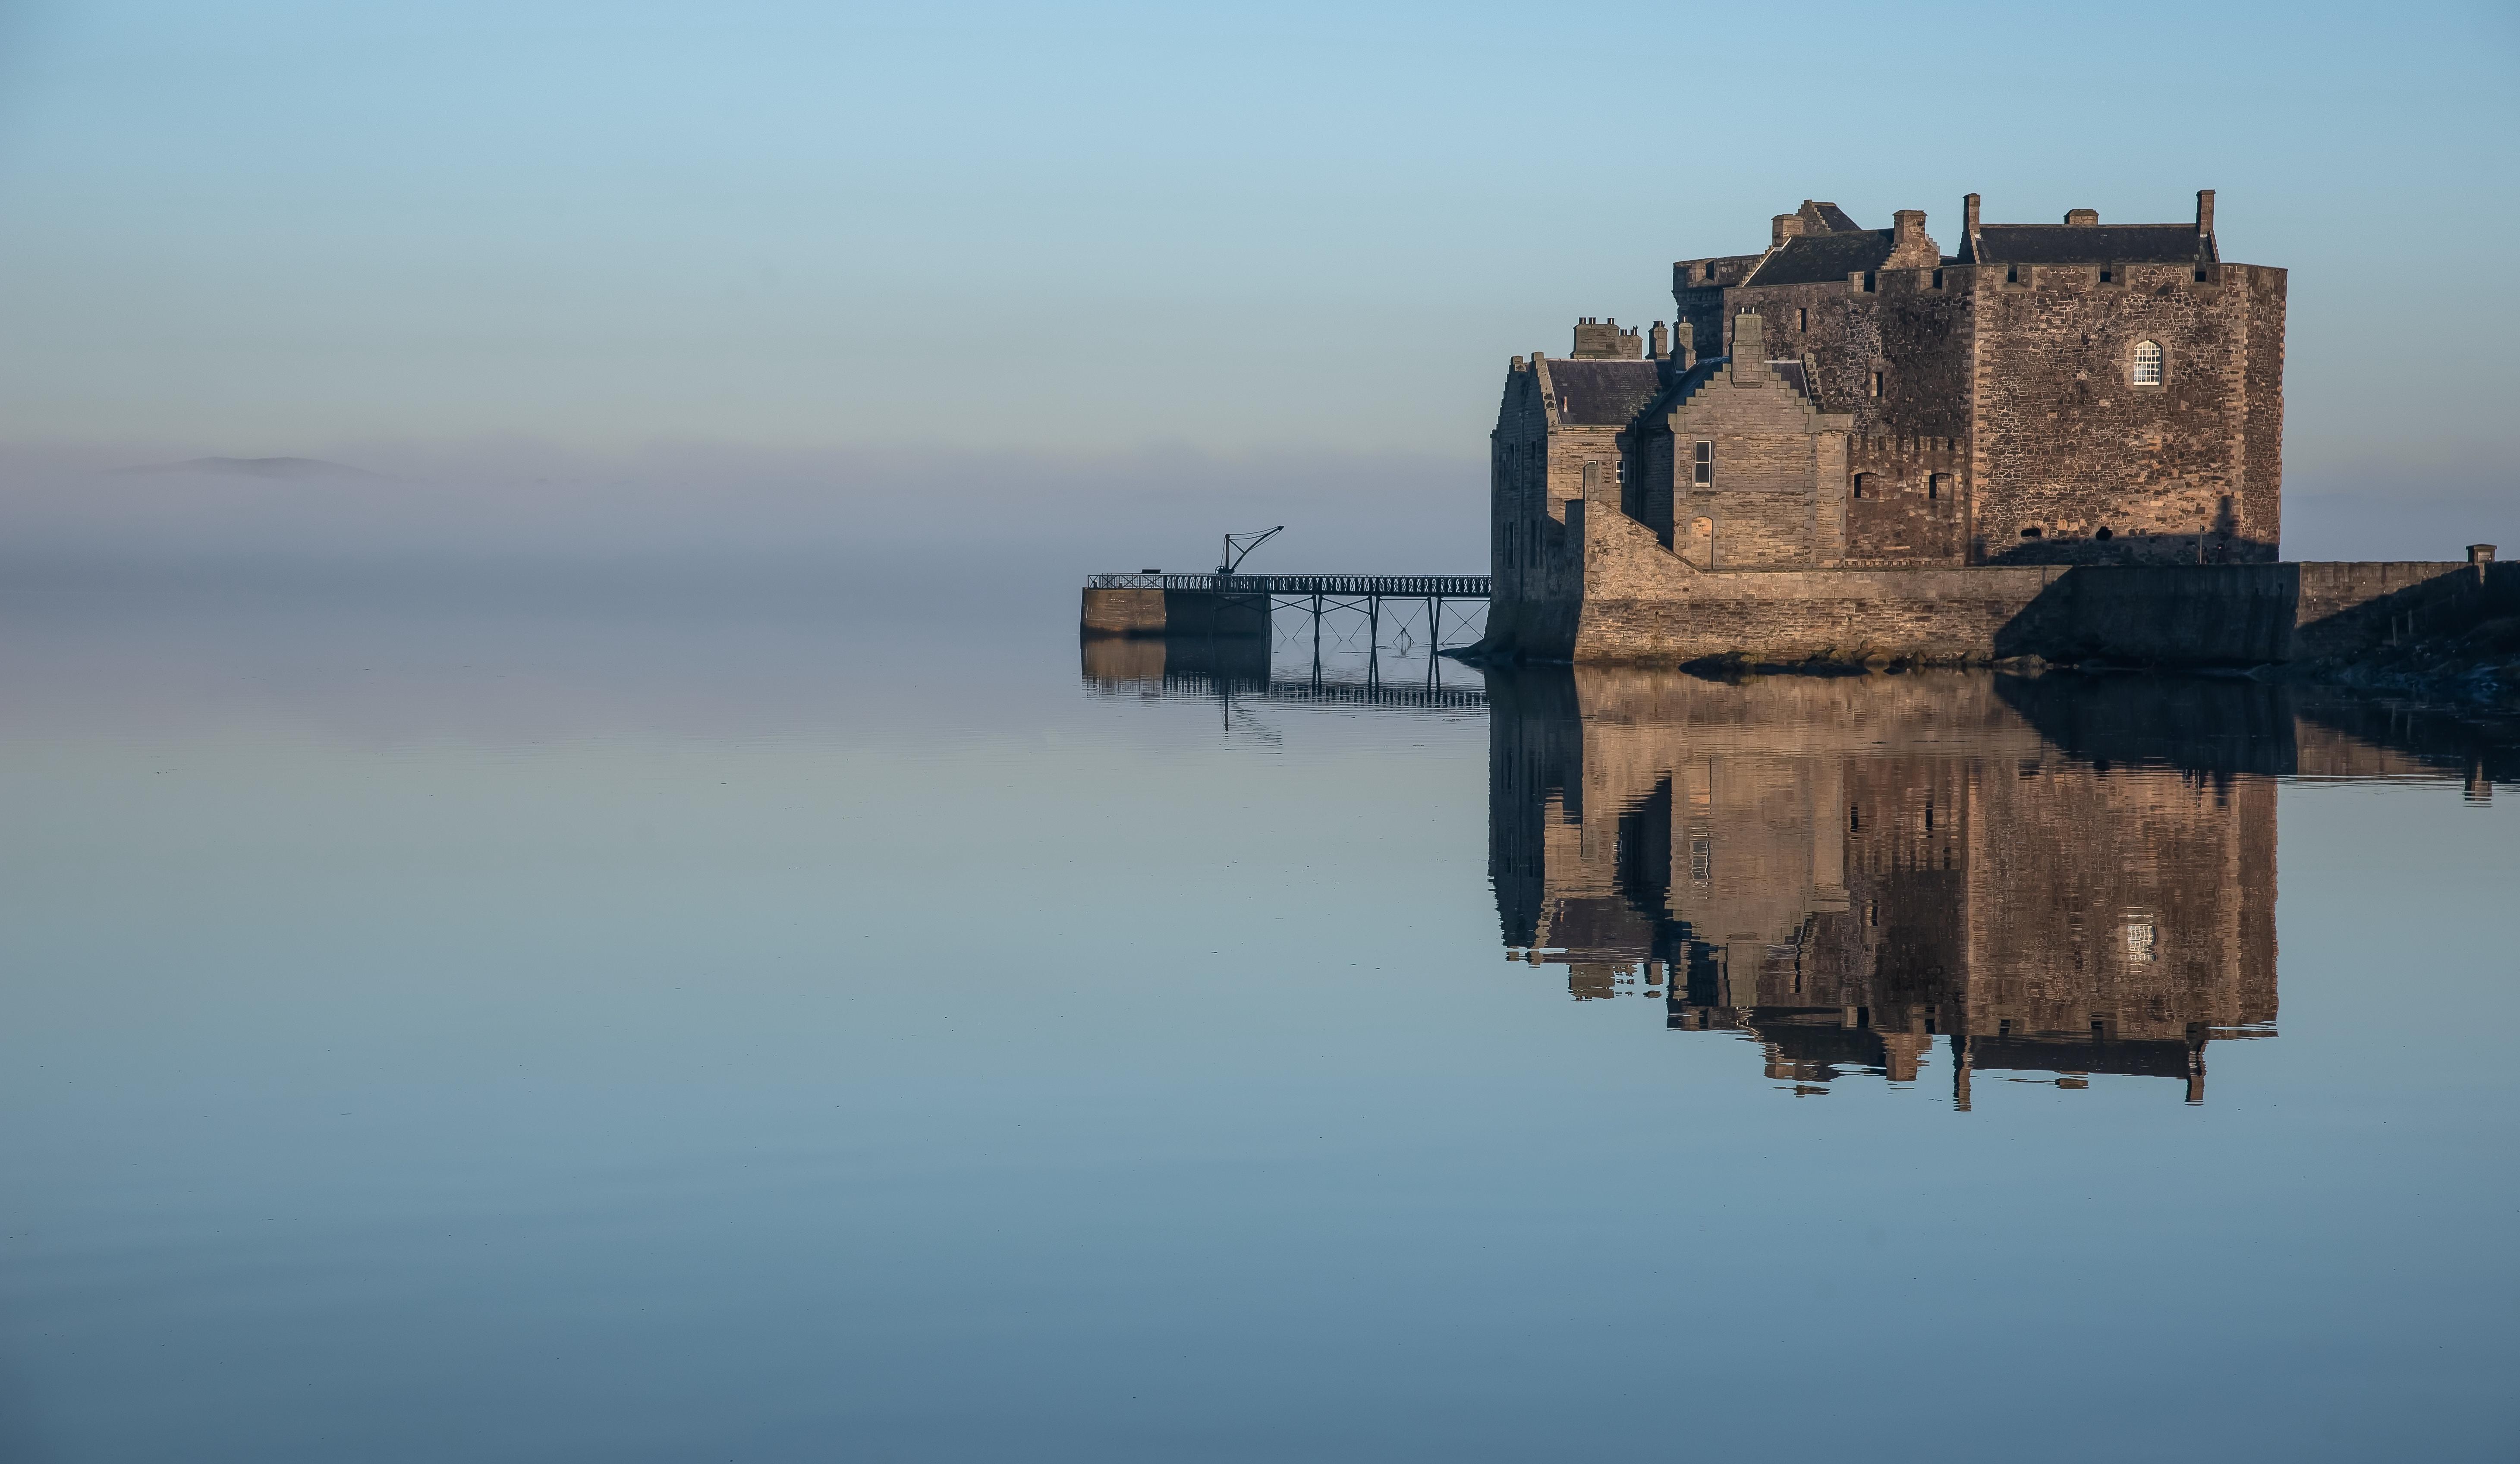 Castle Fog Reflection Scotland 5841x3393